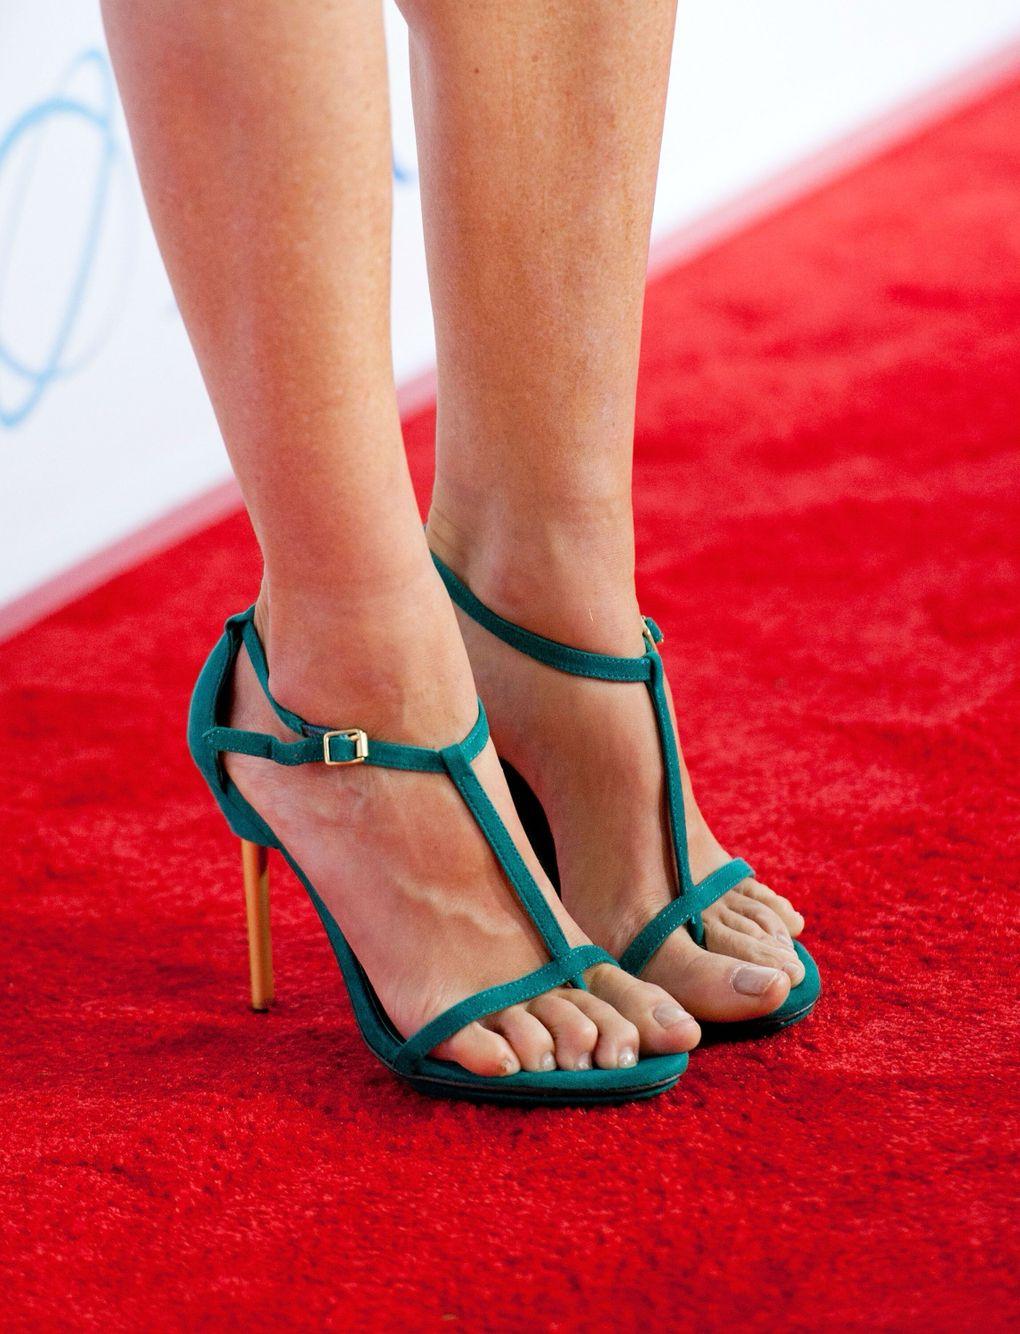 abe72401520 Julie Bowen s High Heels ...XoXo